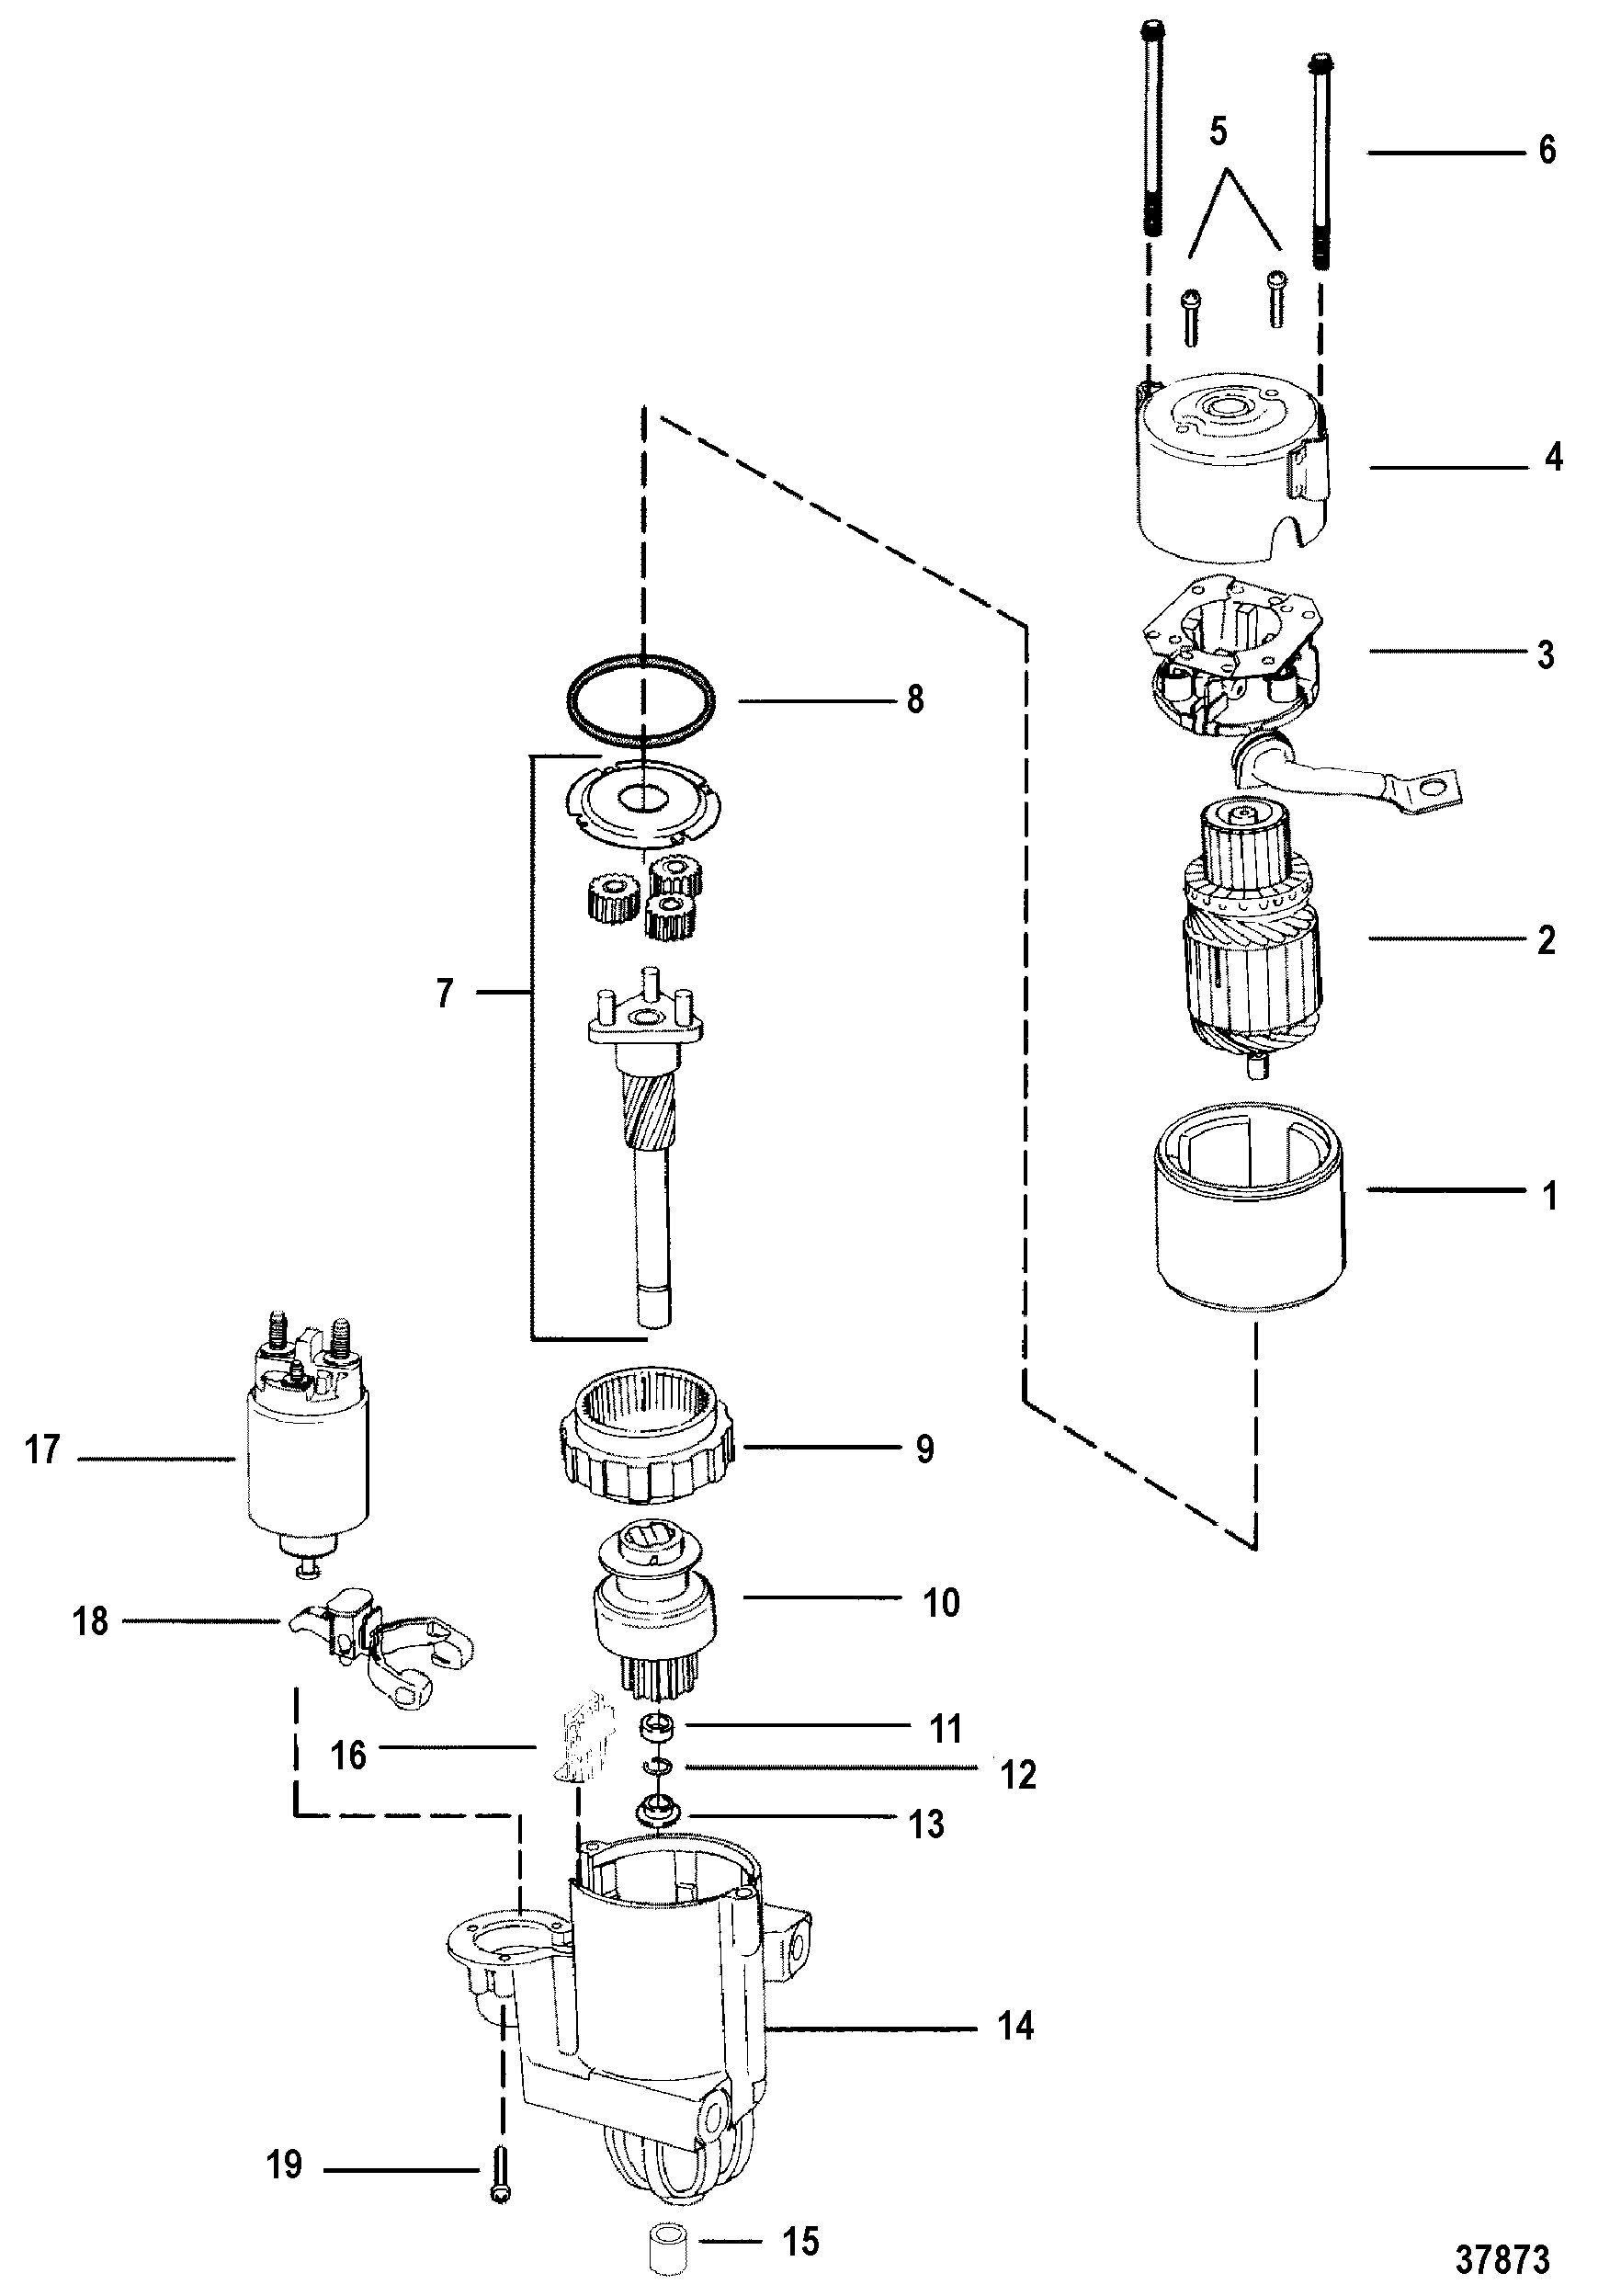 3 liter mercruiser engine diagram